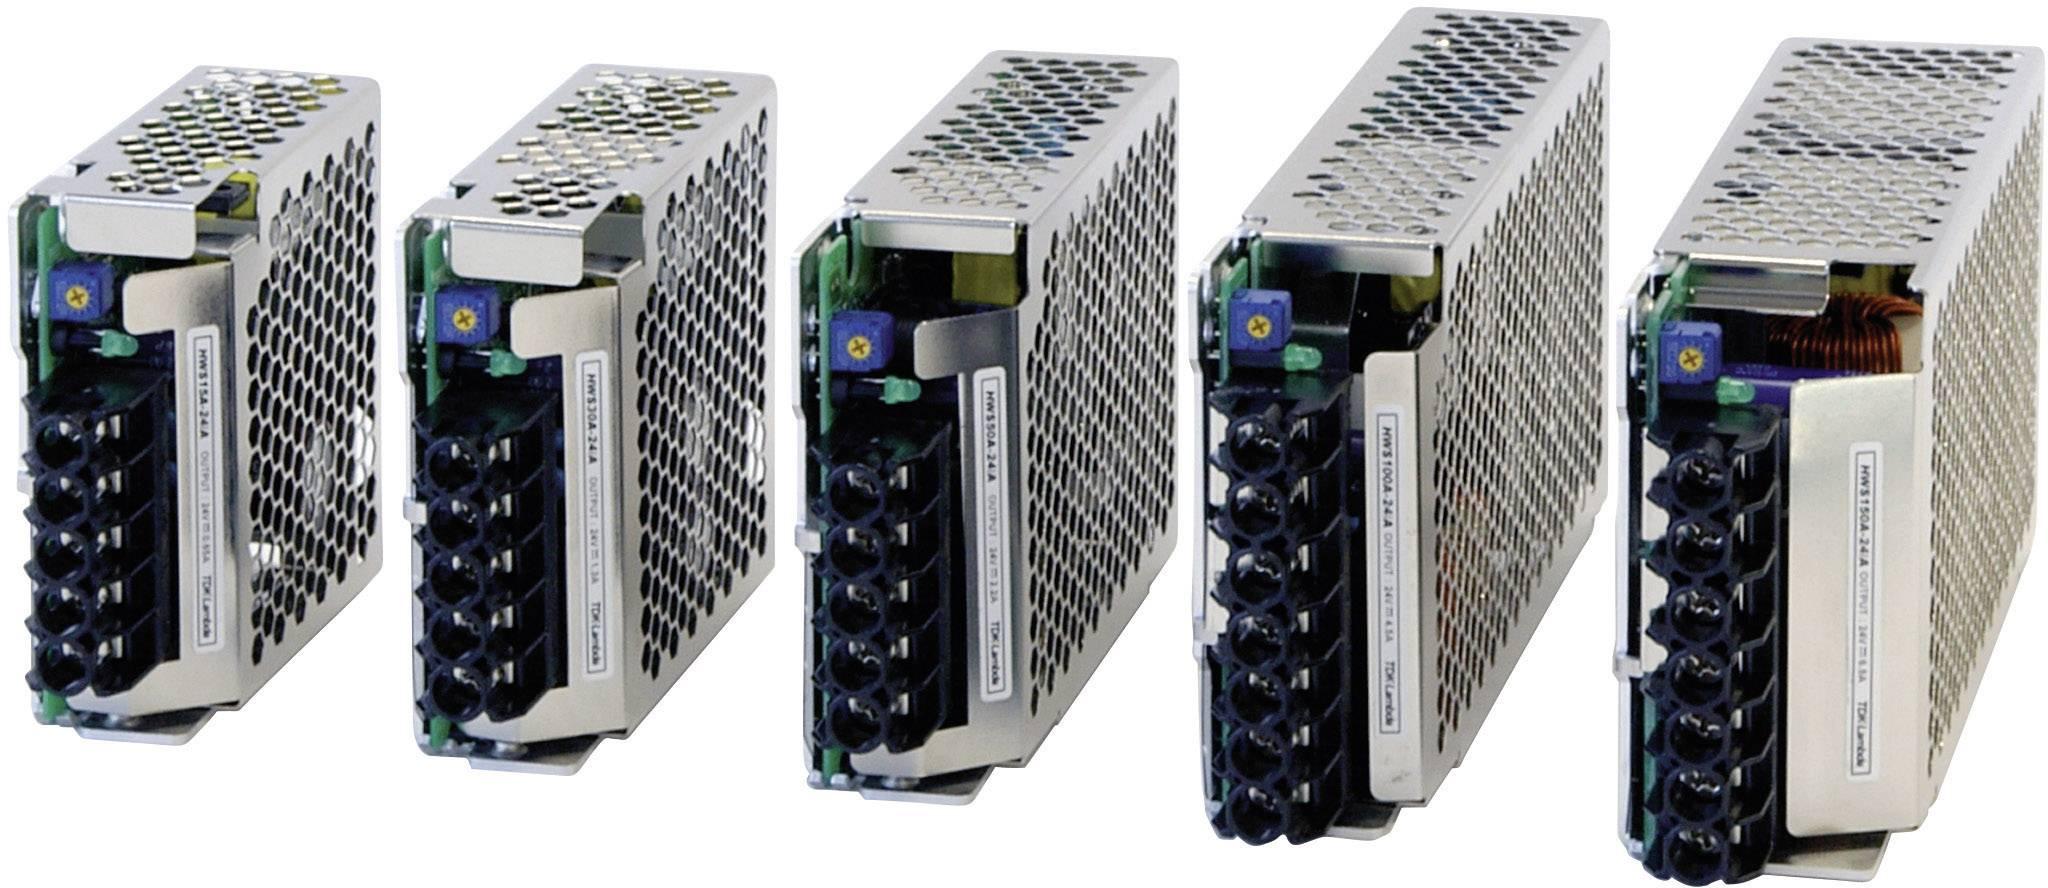 Zabudovateľný napájací zdroj TDK-Lambda HWS-15A-15/A, 15 V, 15 W